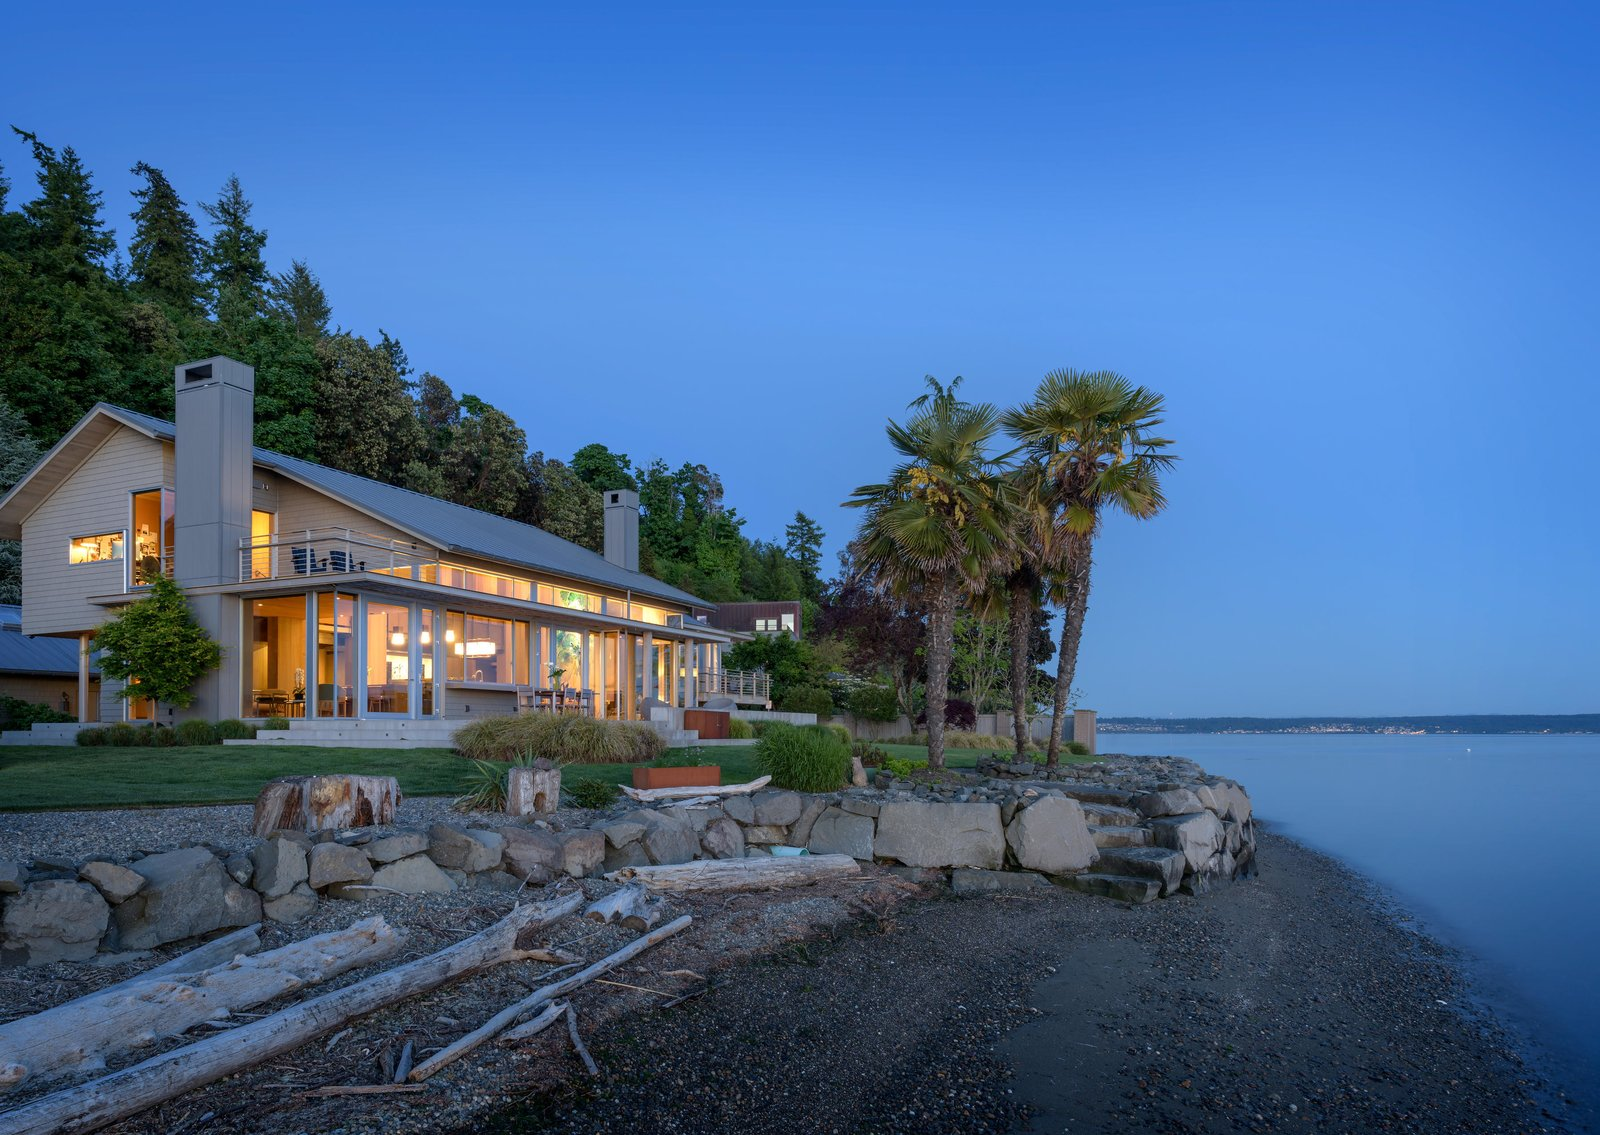 Kitchen Island Lighting >> Fox Island Residence Modern Home in Fox Island, Washington by Olson… on Dwell